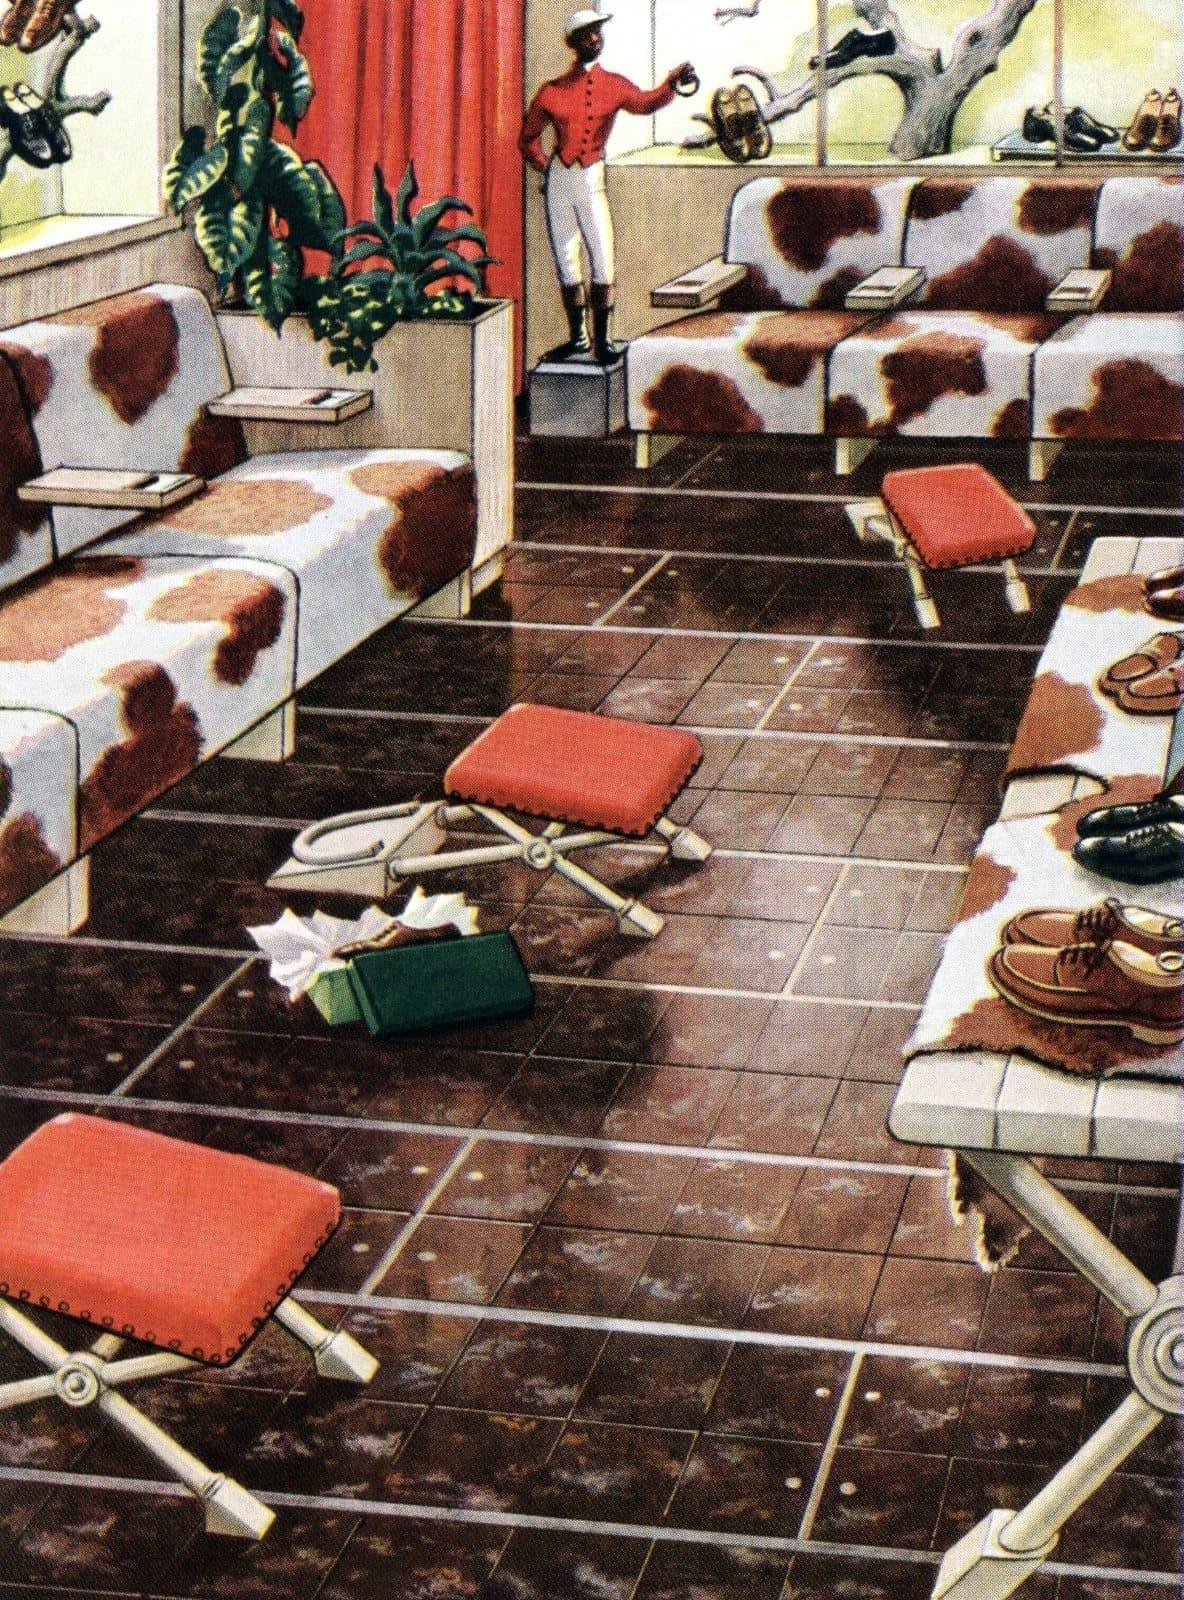 Cowhide-themed vintage shoe store decor (1949)